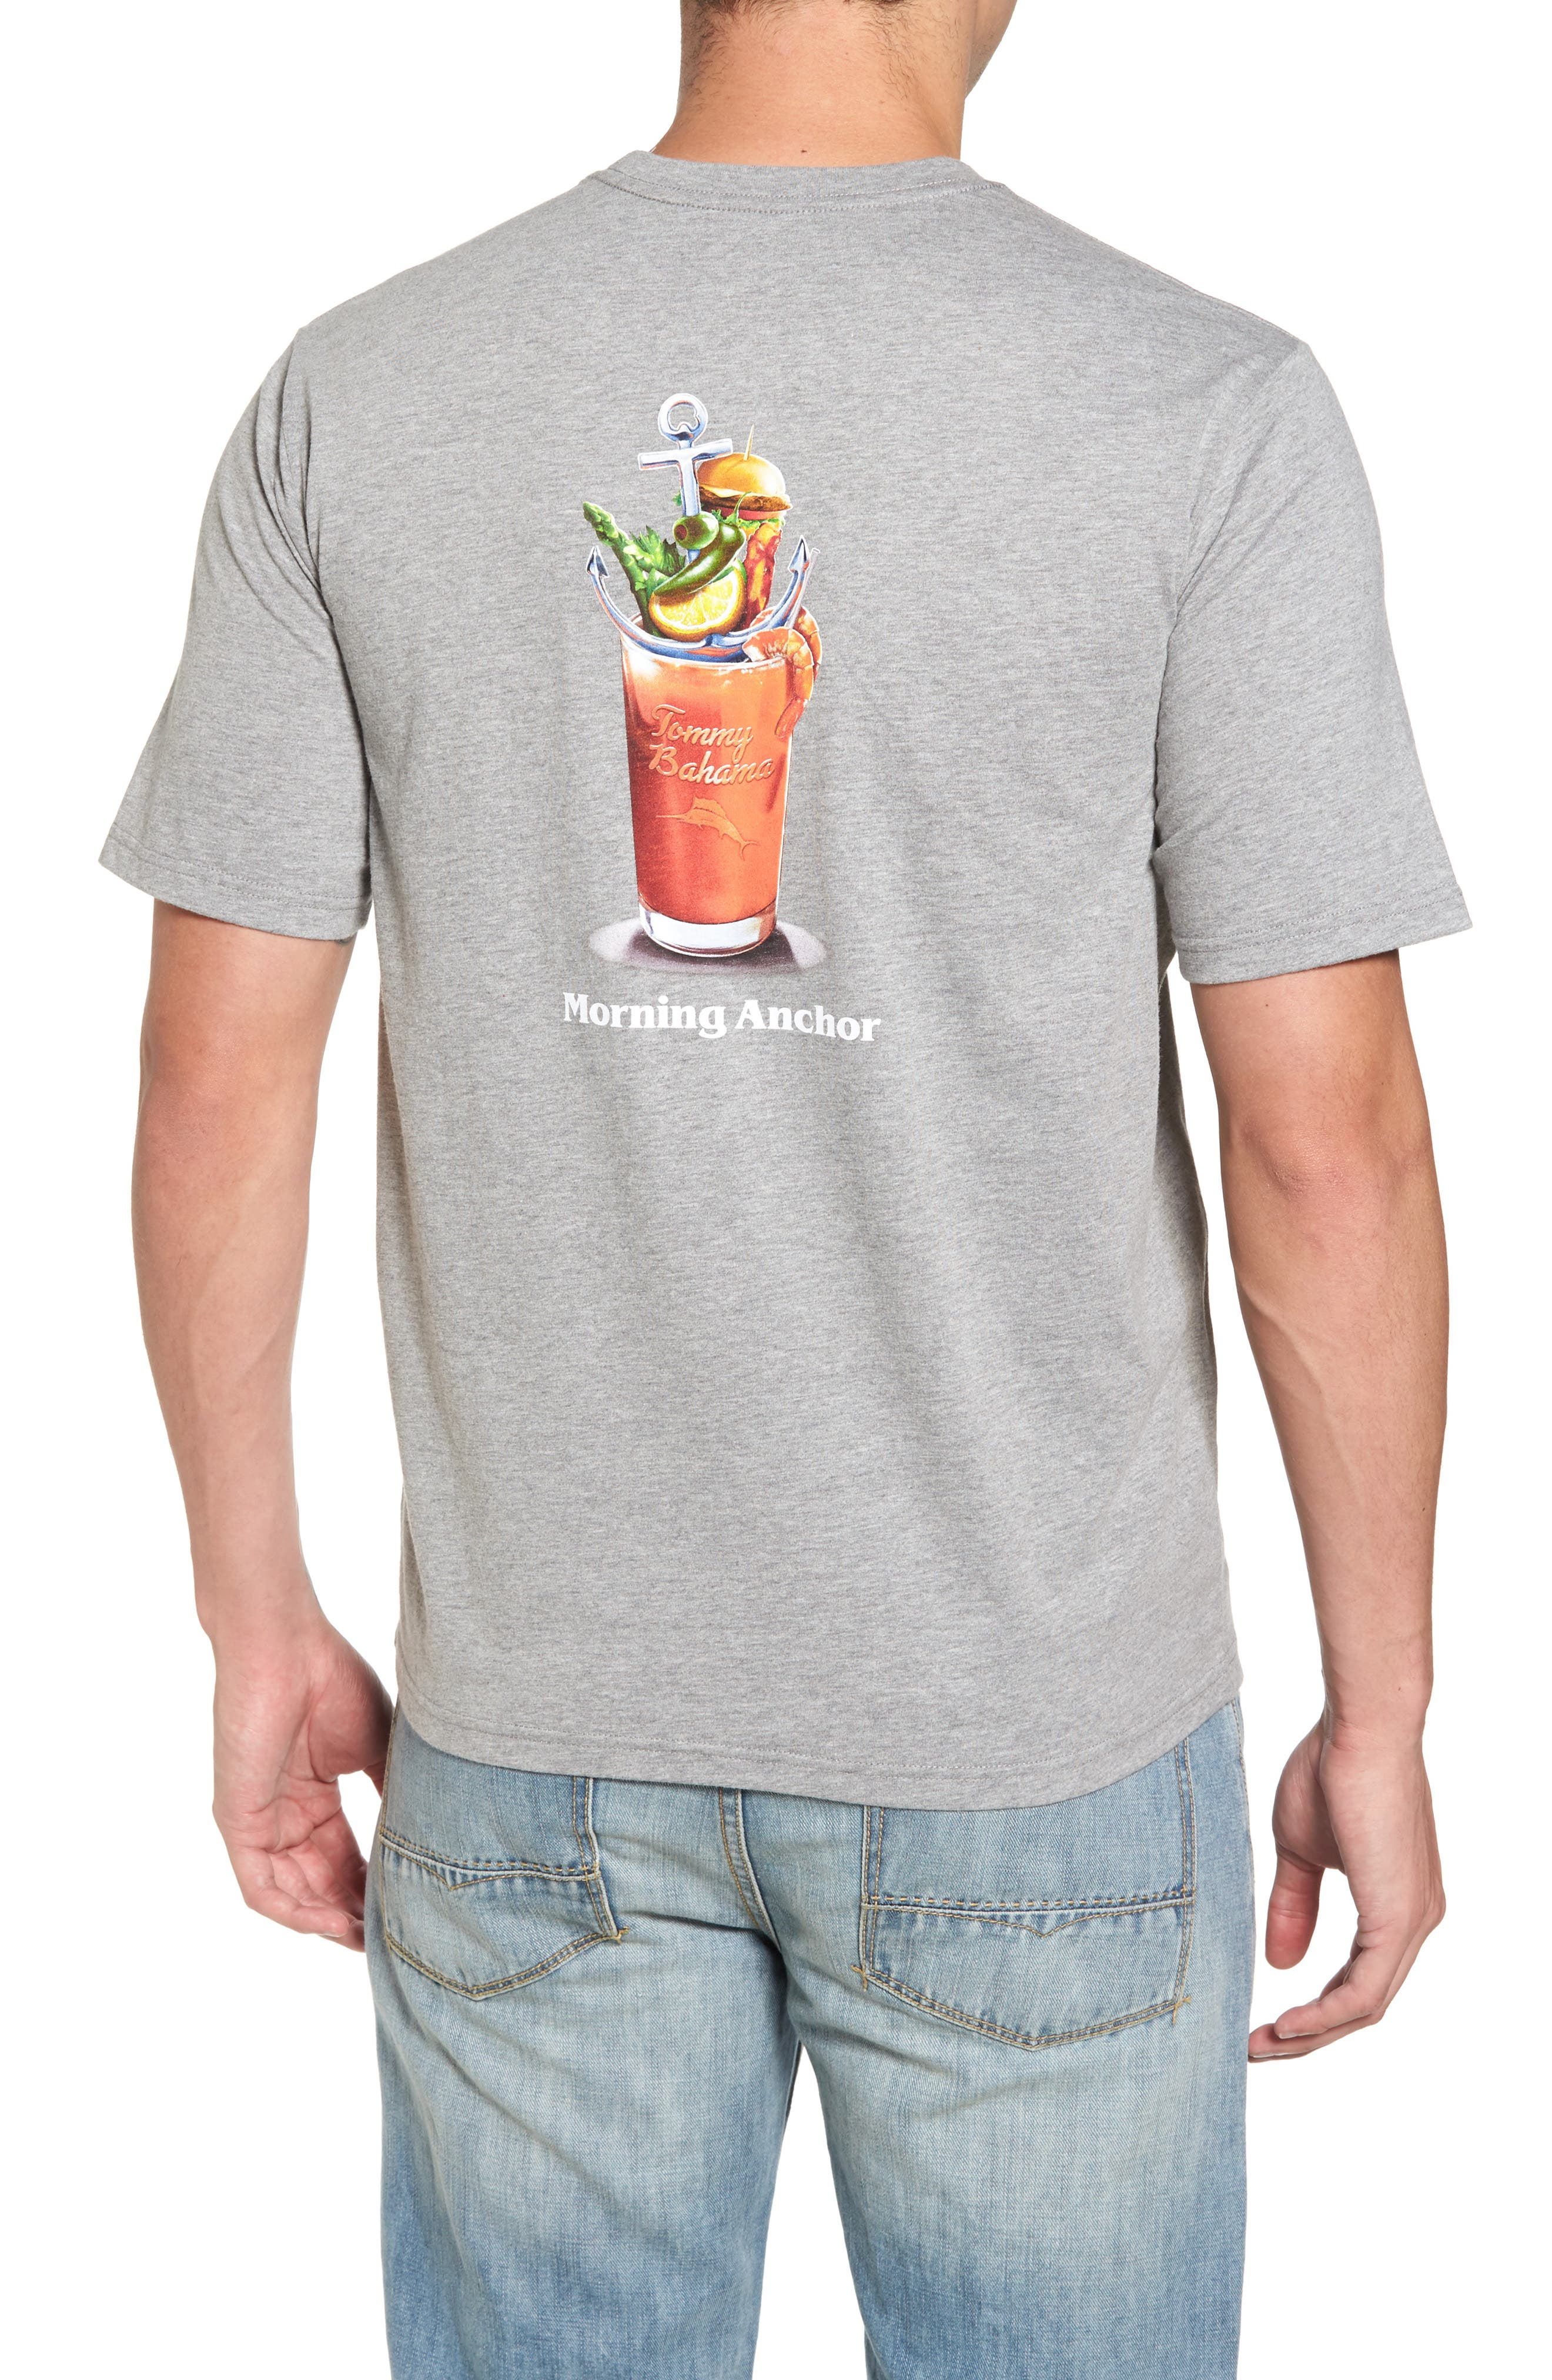 Morning Anchor Graphic T-Shirt,                             Alternate thumbnail 2, color,                             020